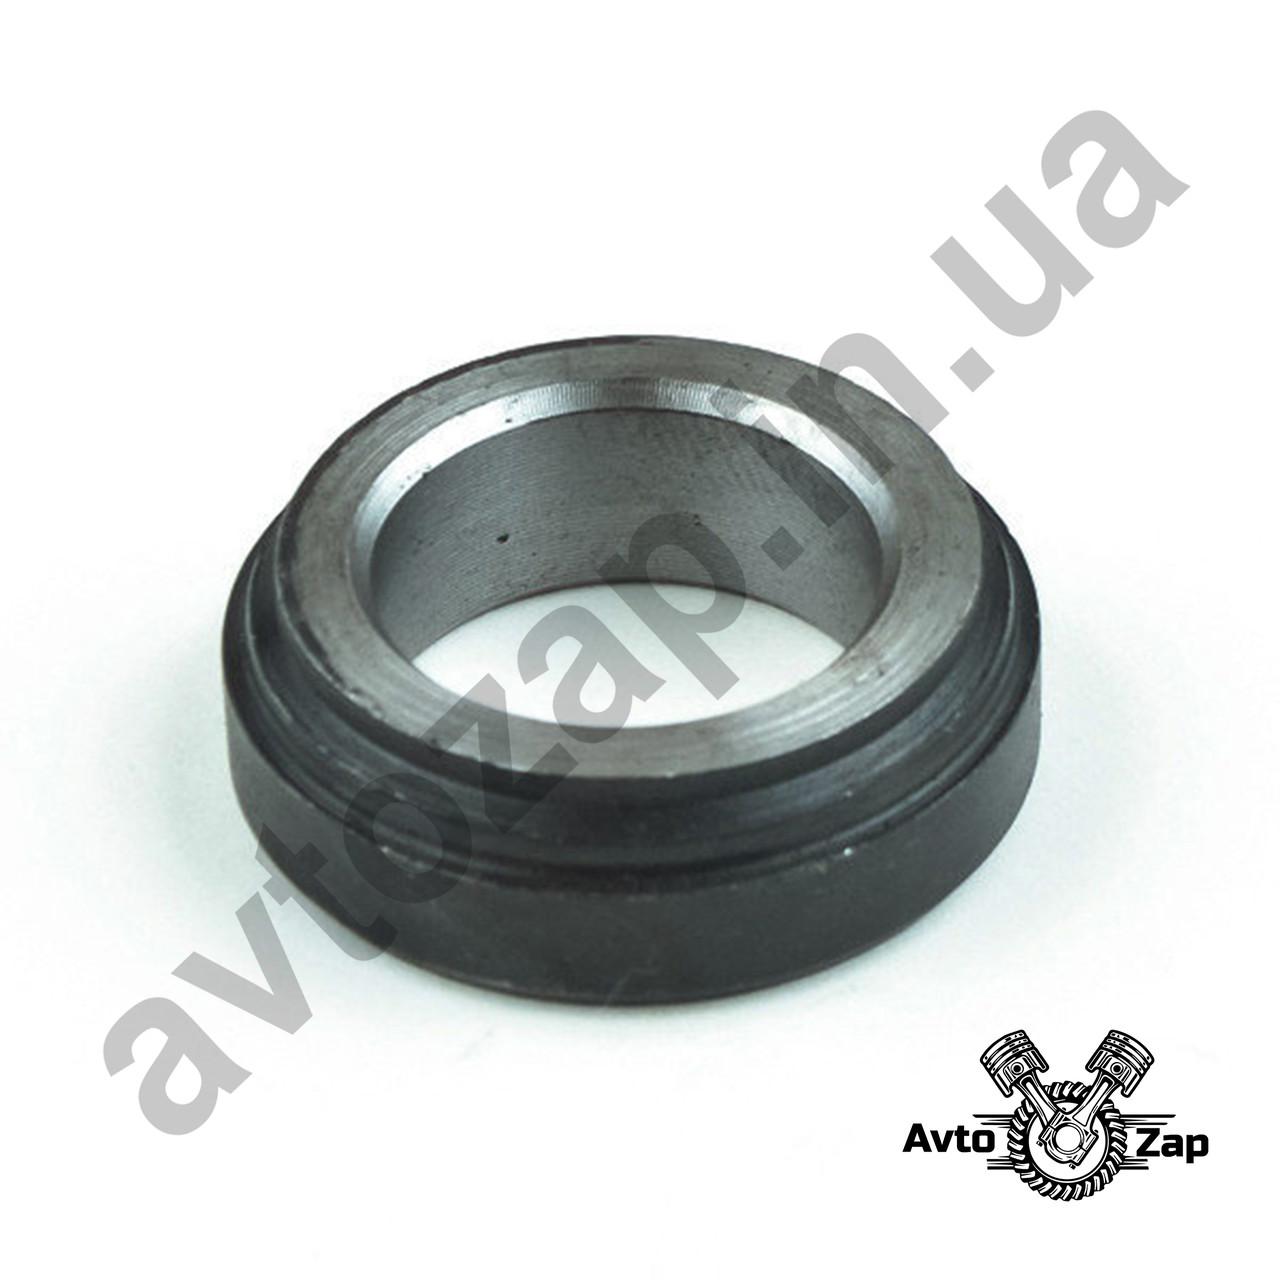 Кольцо запорное полуоси ВАЗ 2101-07  32478